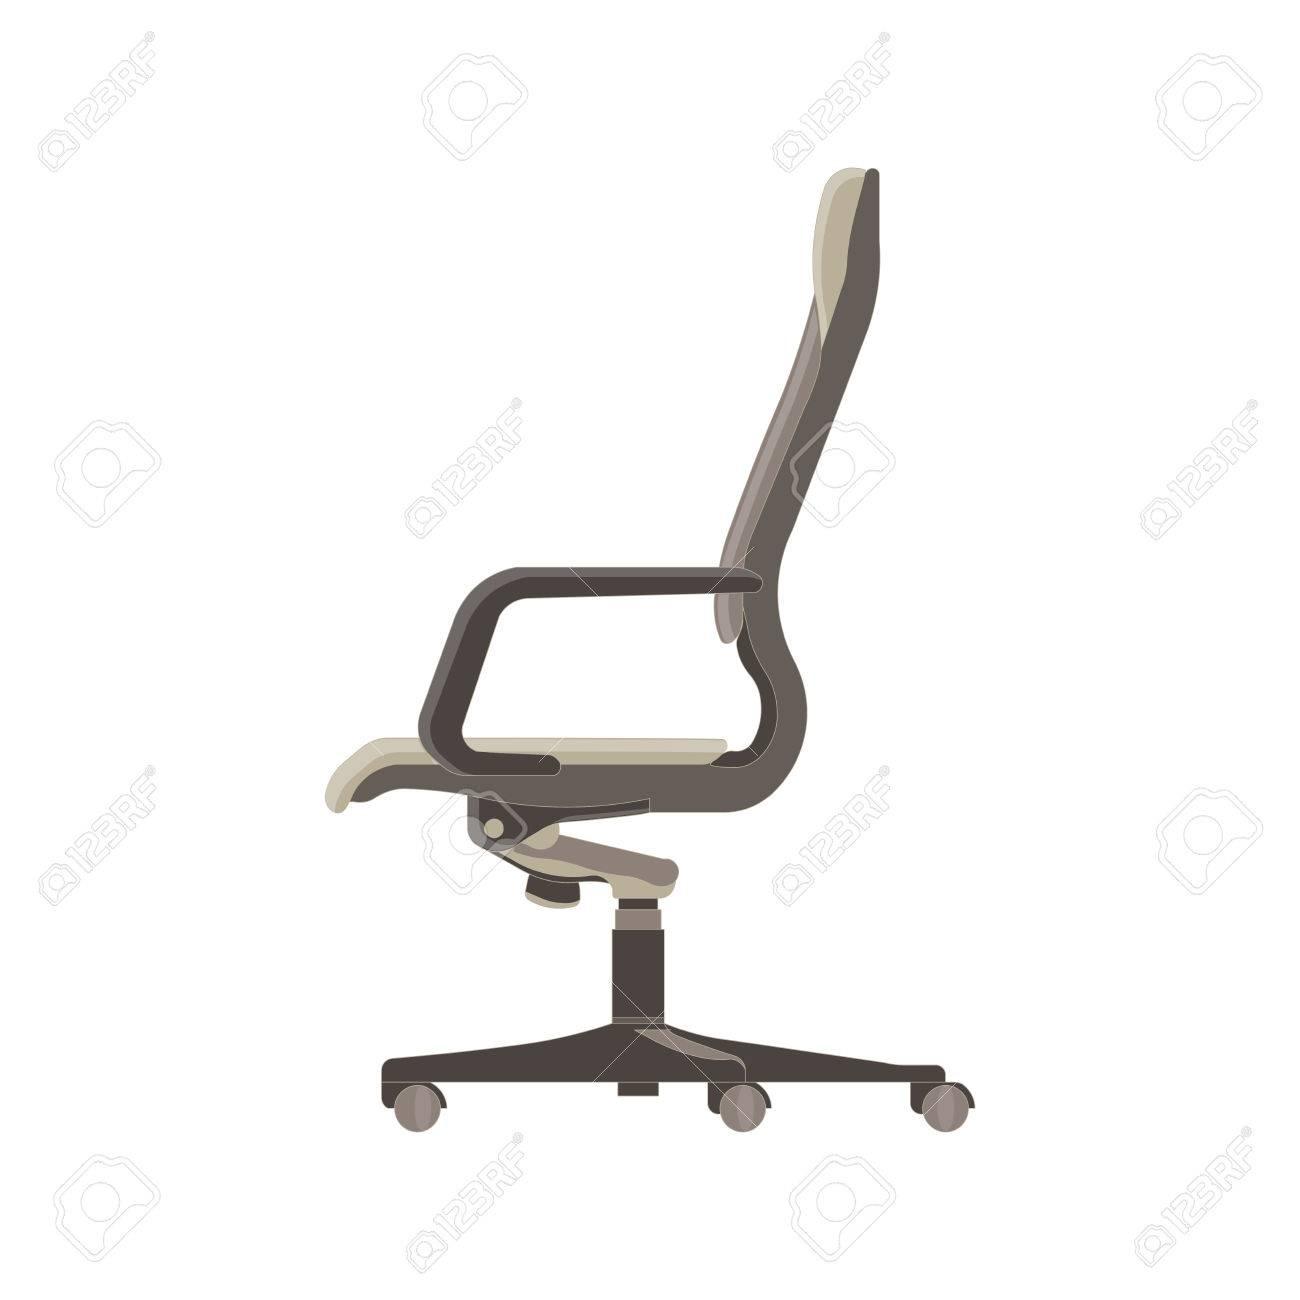 Gentil Furniture Side View Illustration Design Style. Arm Armchair Black Boss  Business Comfort. Element Empty Ergonomic Shape Office Silhouette Seat  Symbol. White.